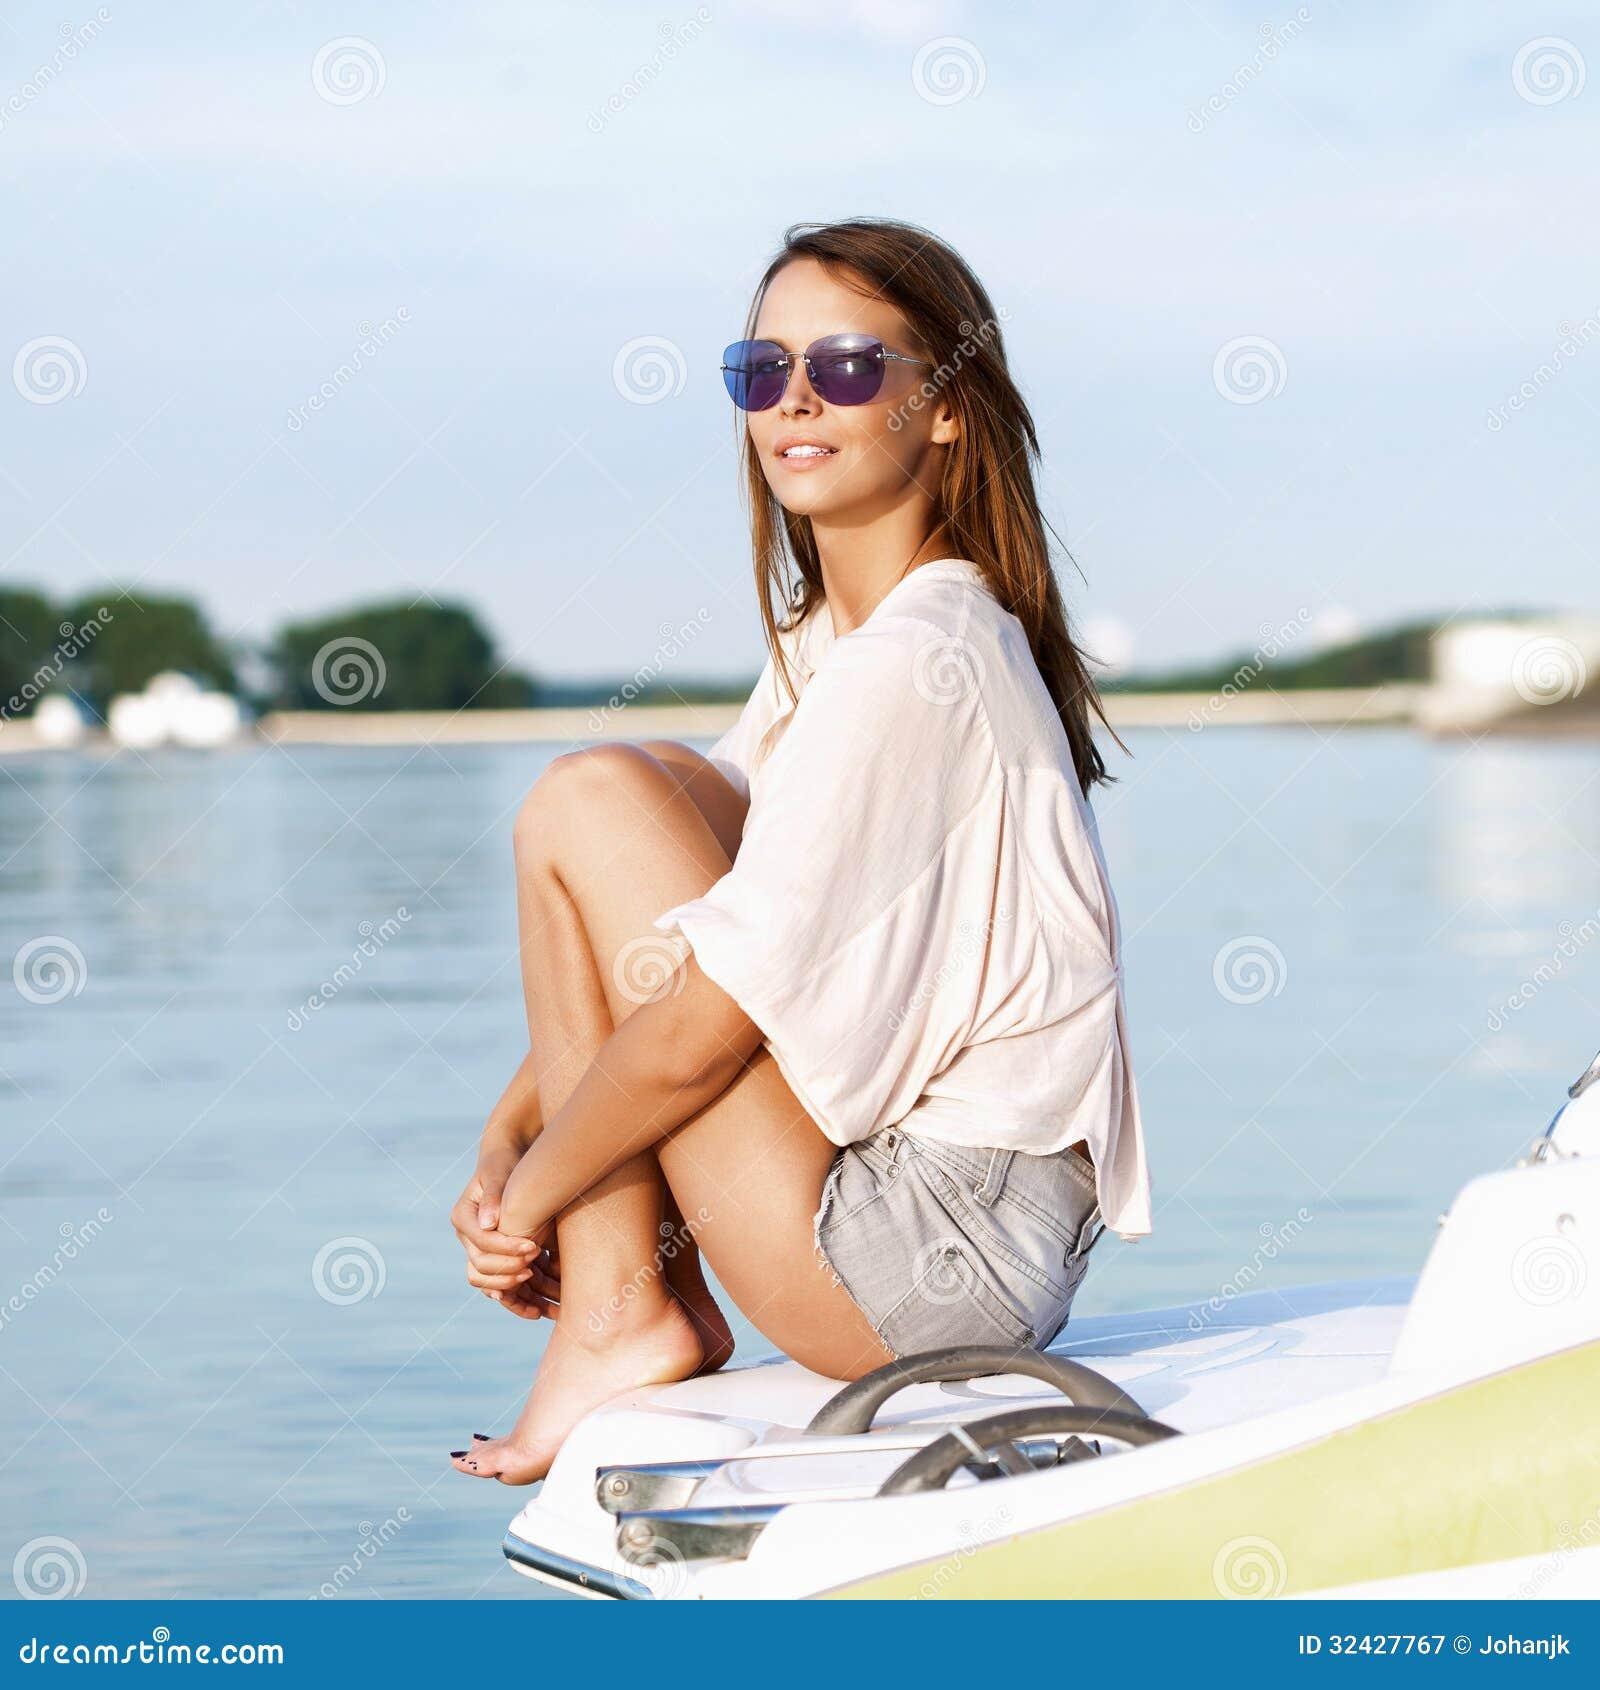 Fashion Boat Girl Illustrations